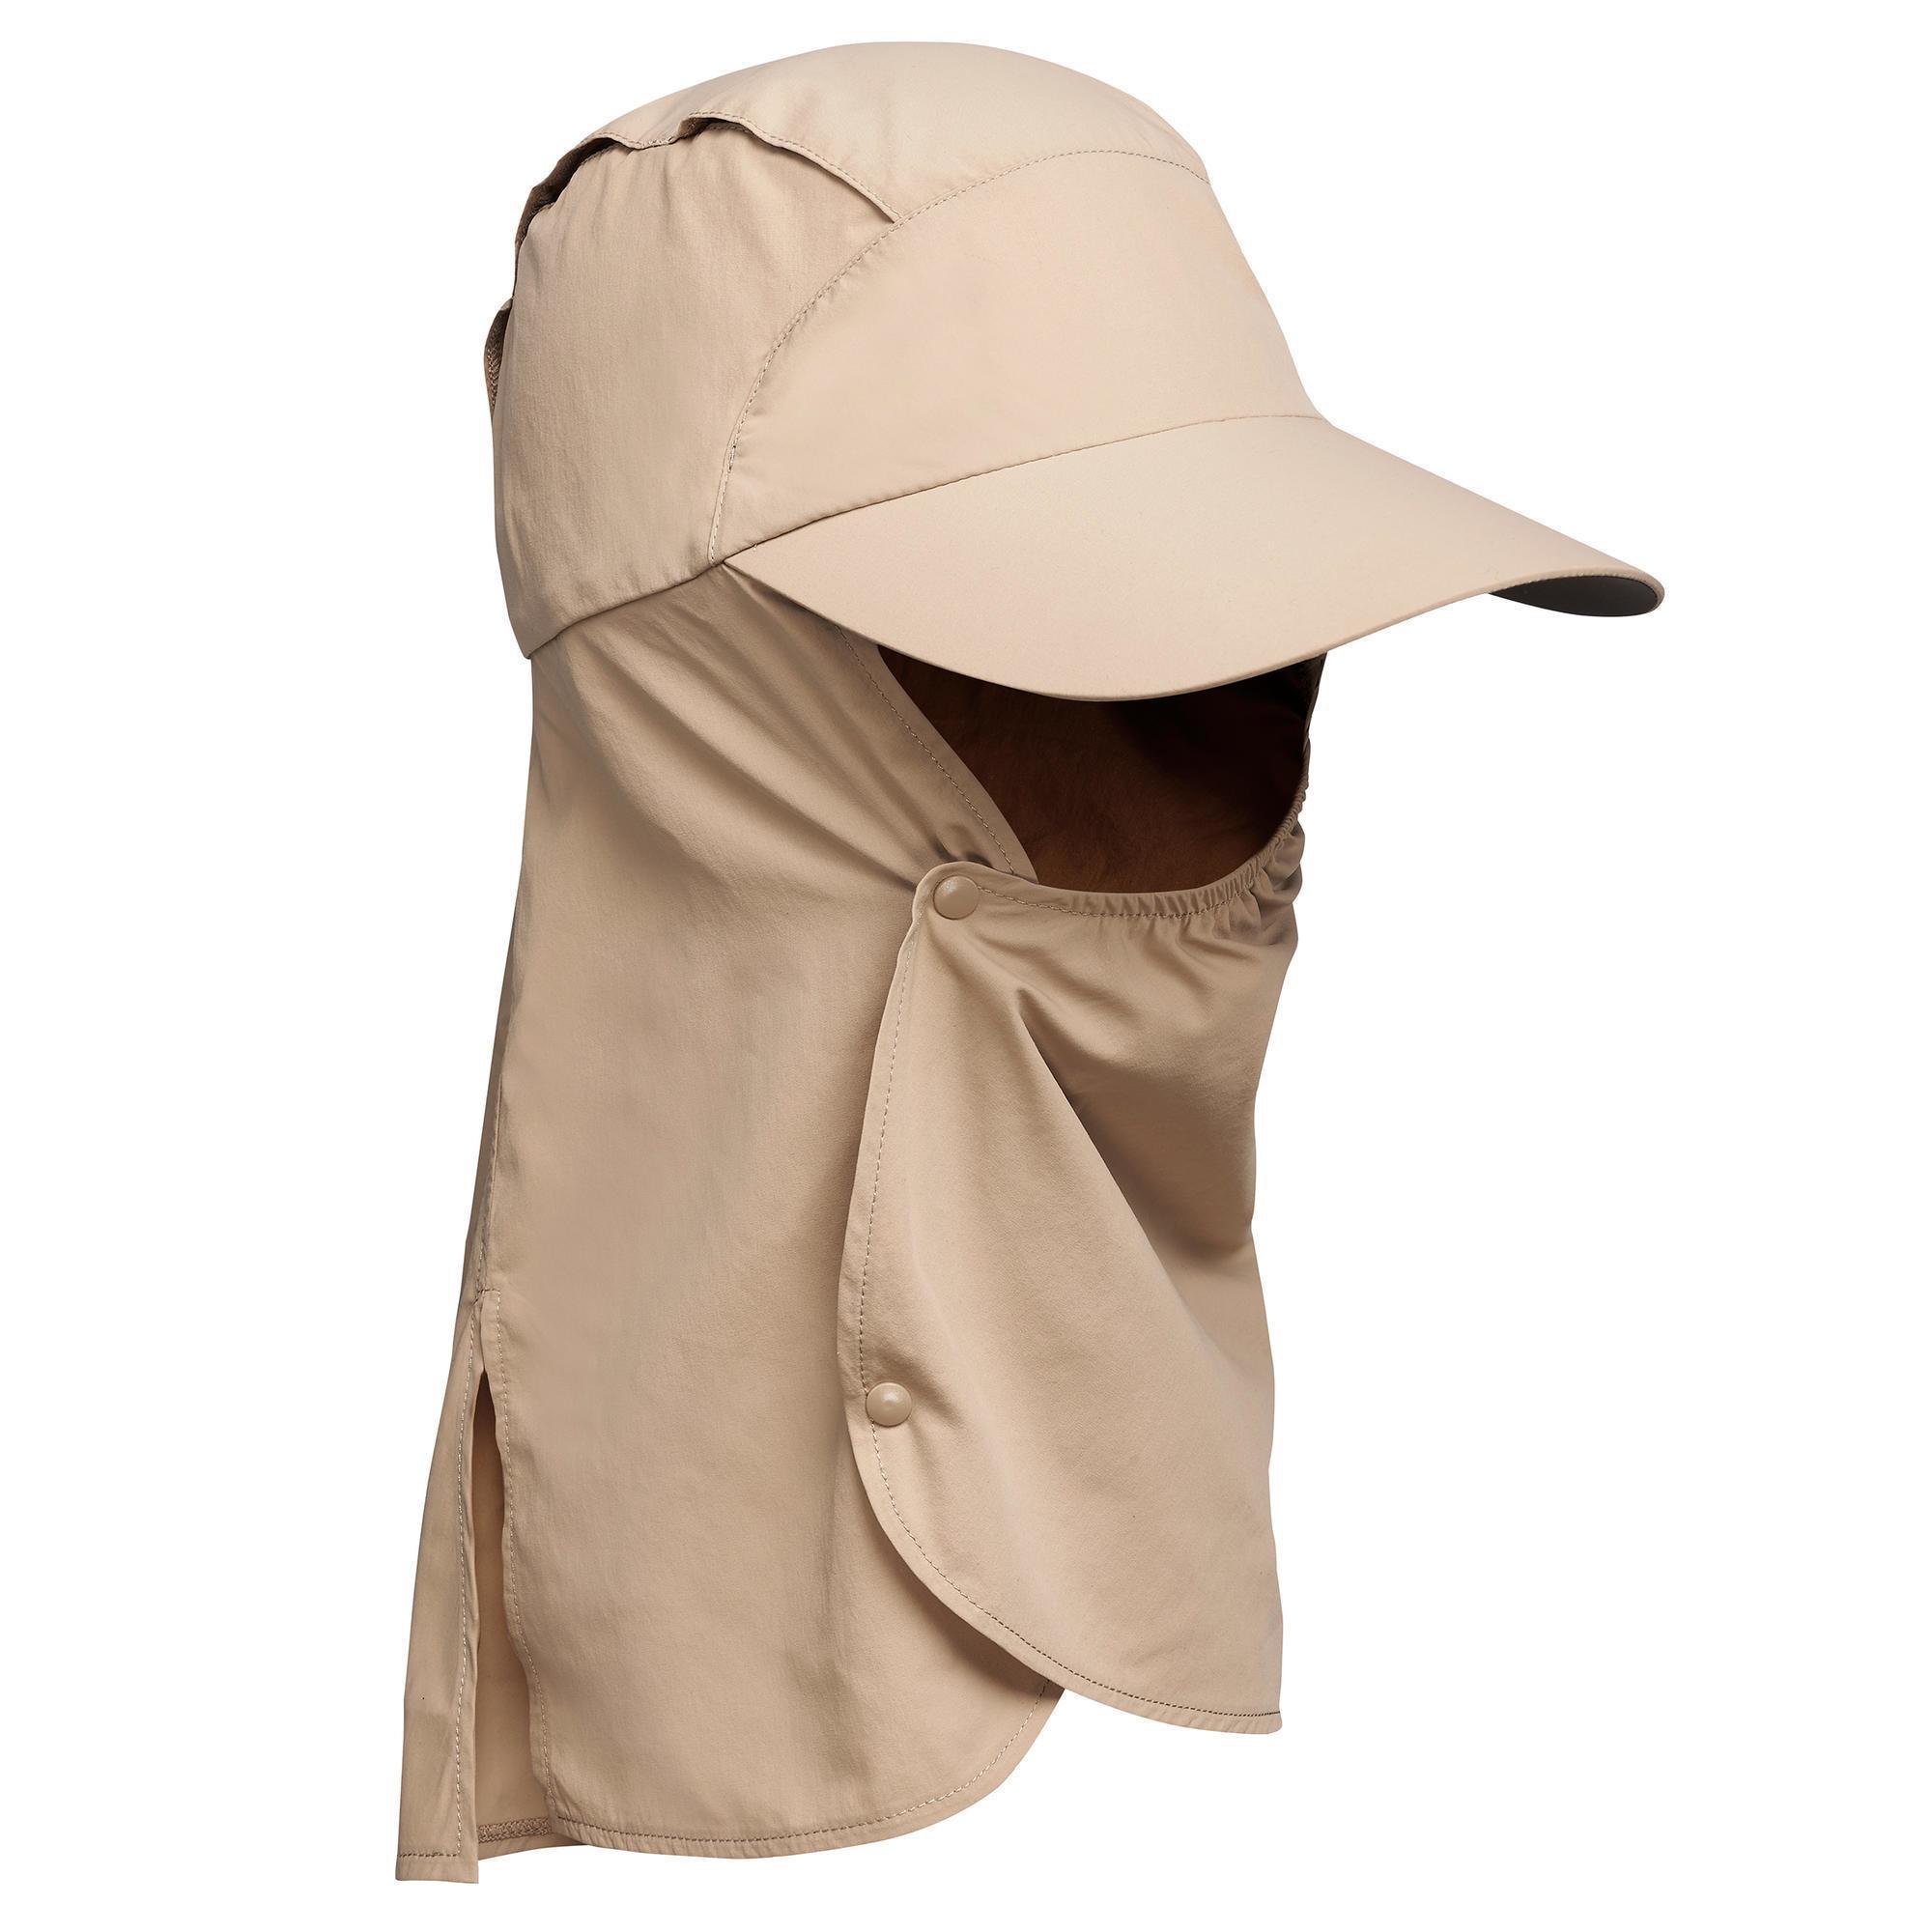 Schirmmütze Cap Desert 500 UV-Schutz braun | Accessoires > Caps | Forclaz